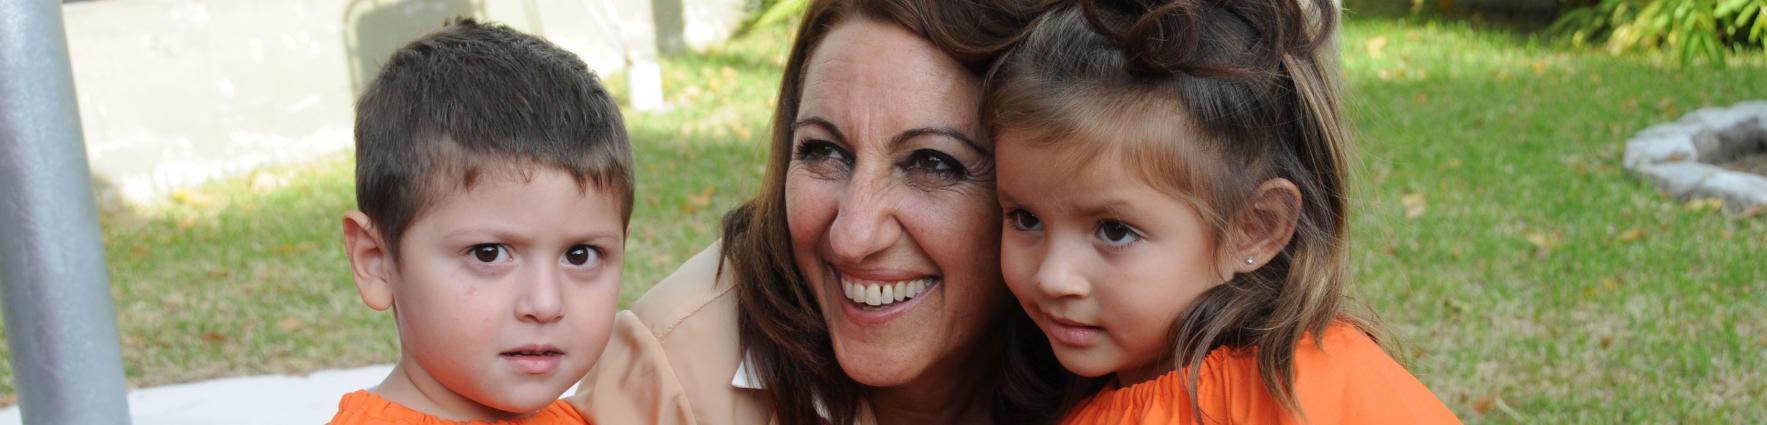 Mónica Fein junto a niños del programa PIE